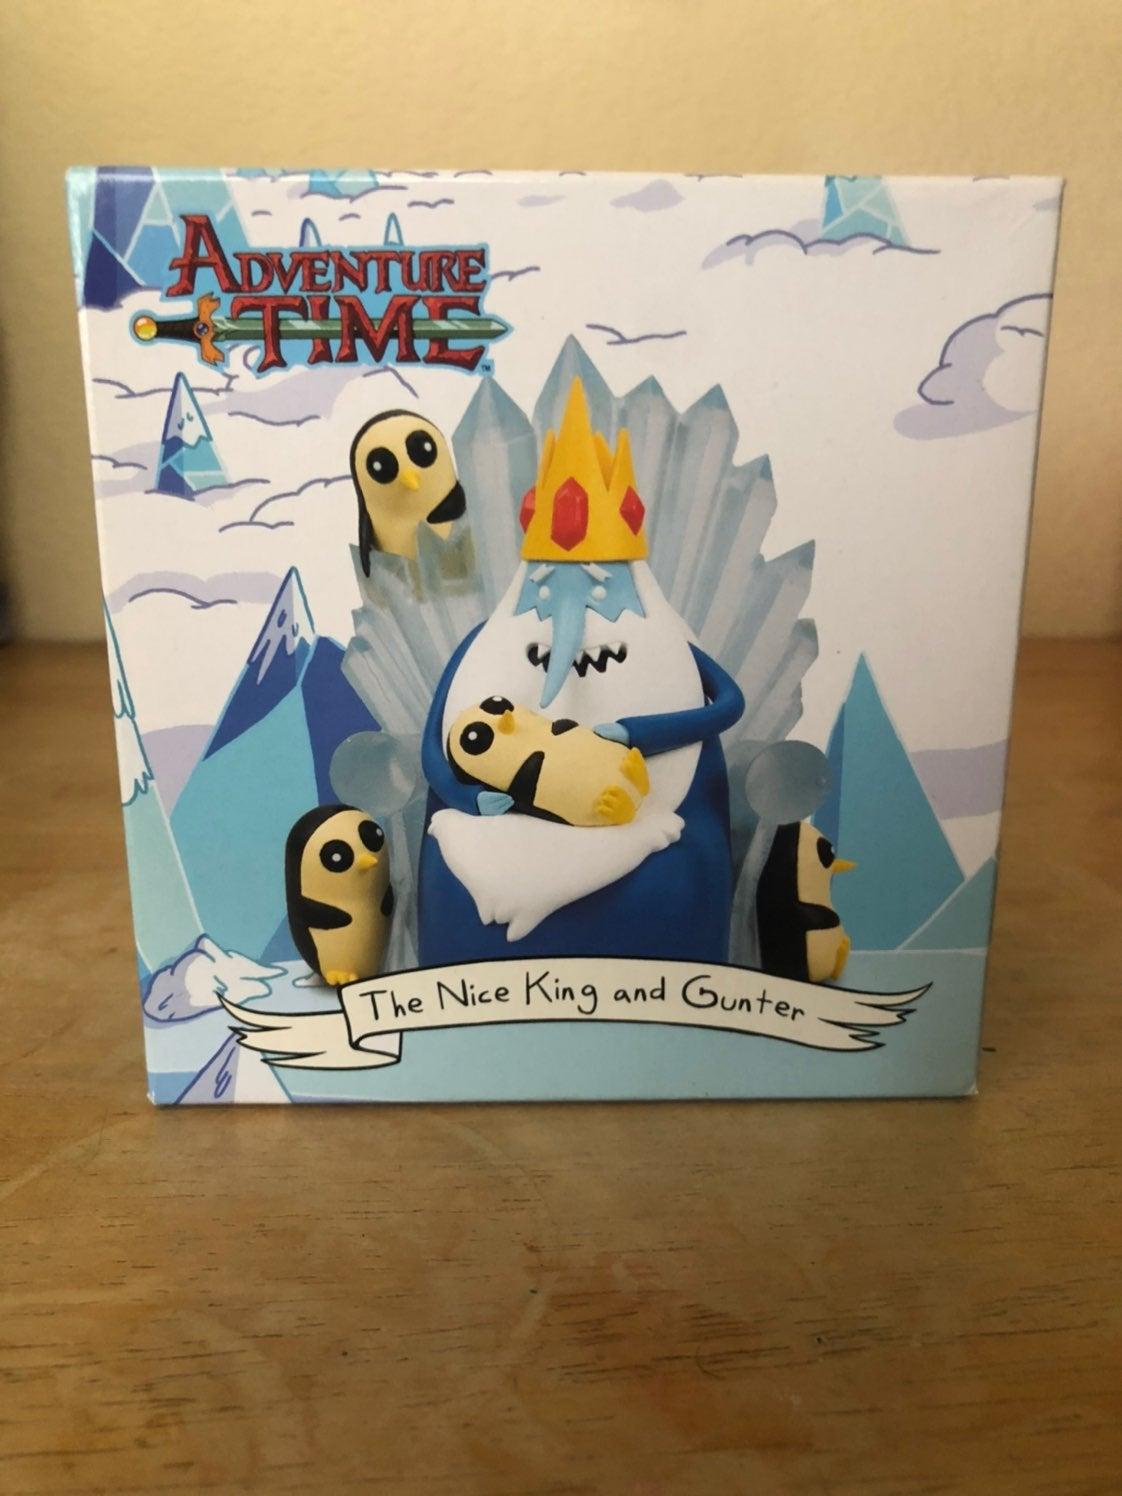 Adventure time mini collectible